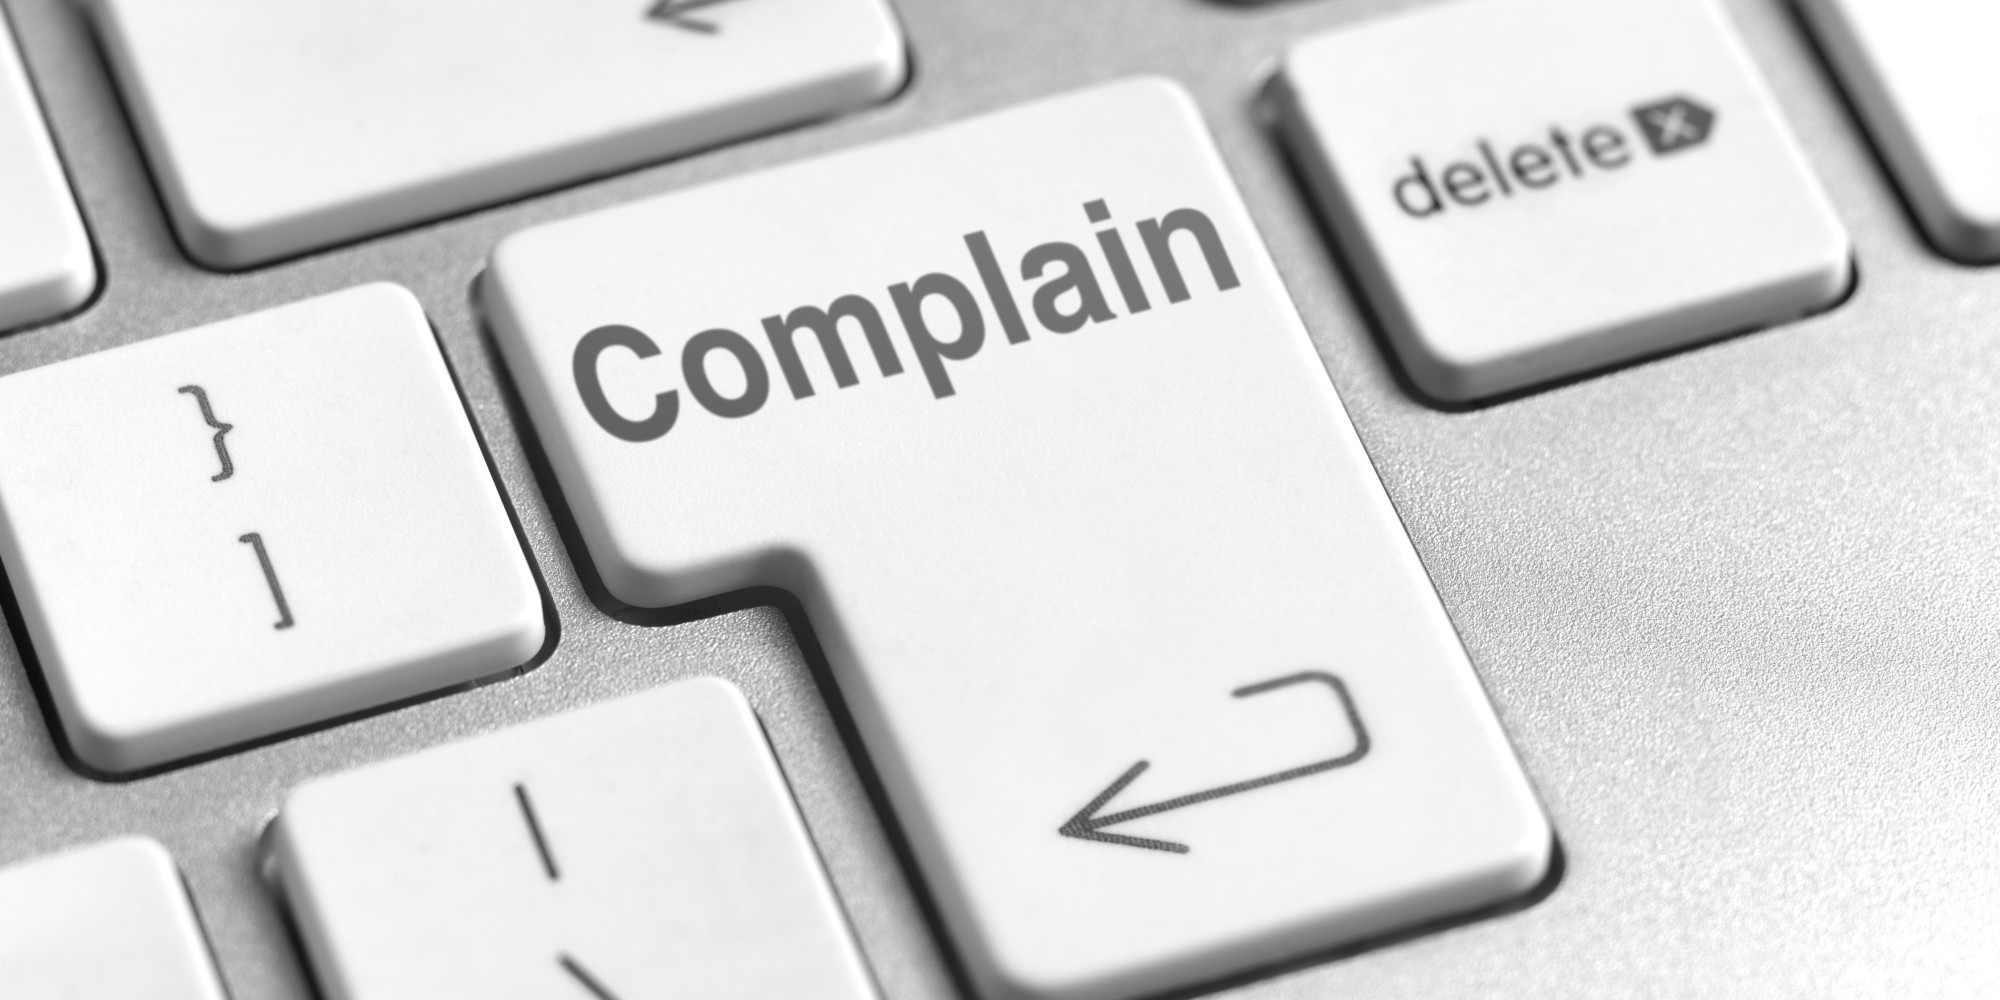 Conscious Complaining 5 Ways To Transform Complaints Into